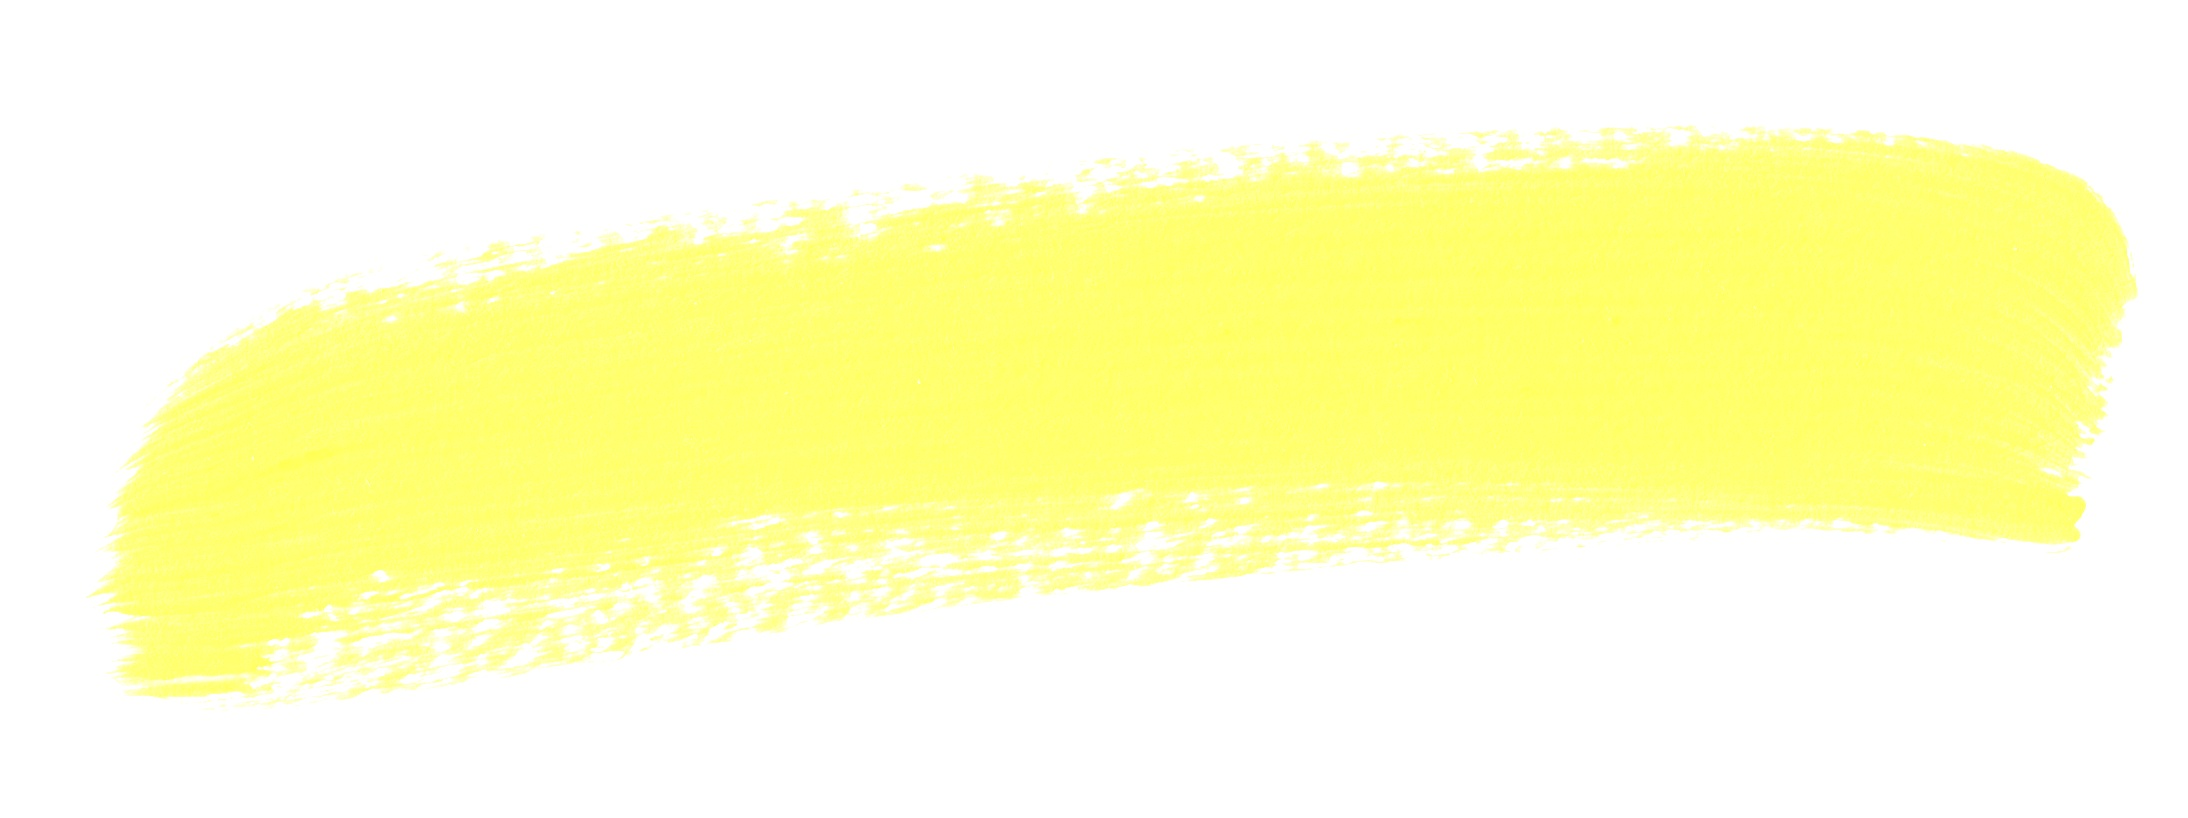 Swoosh_gelb_01.jpg